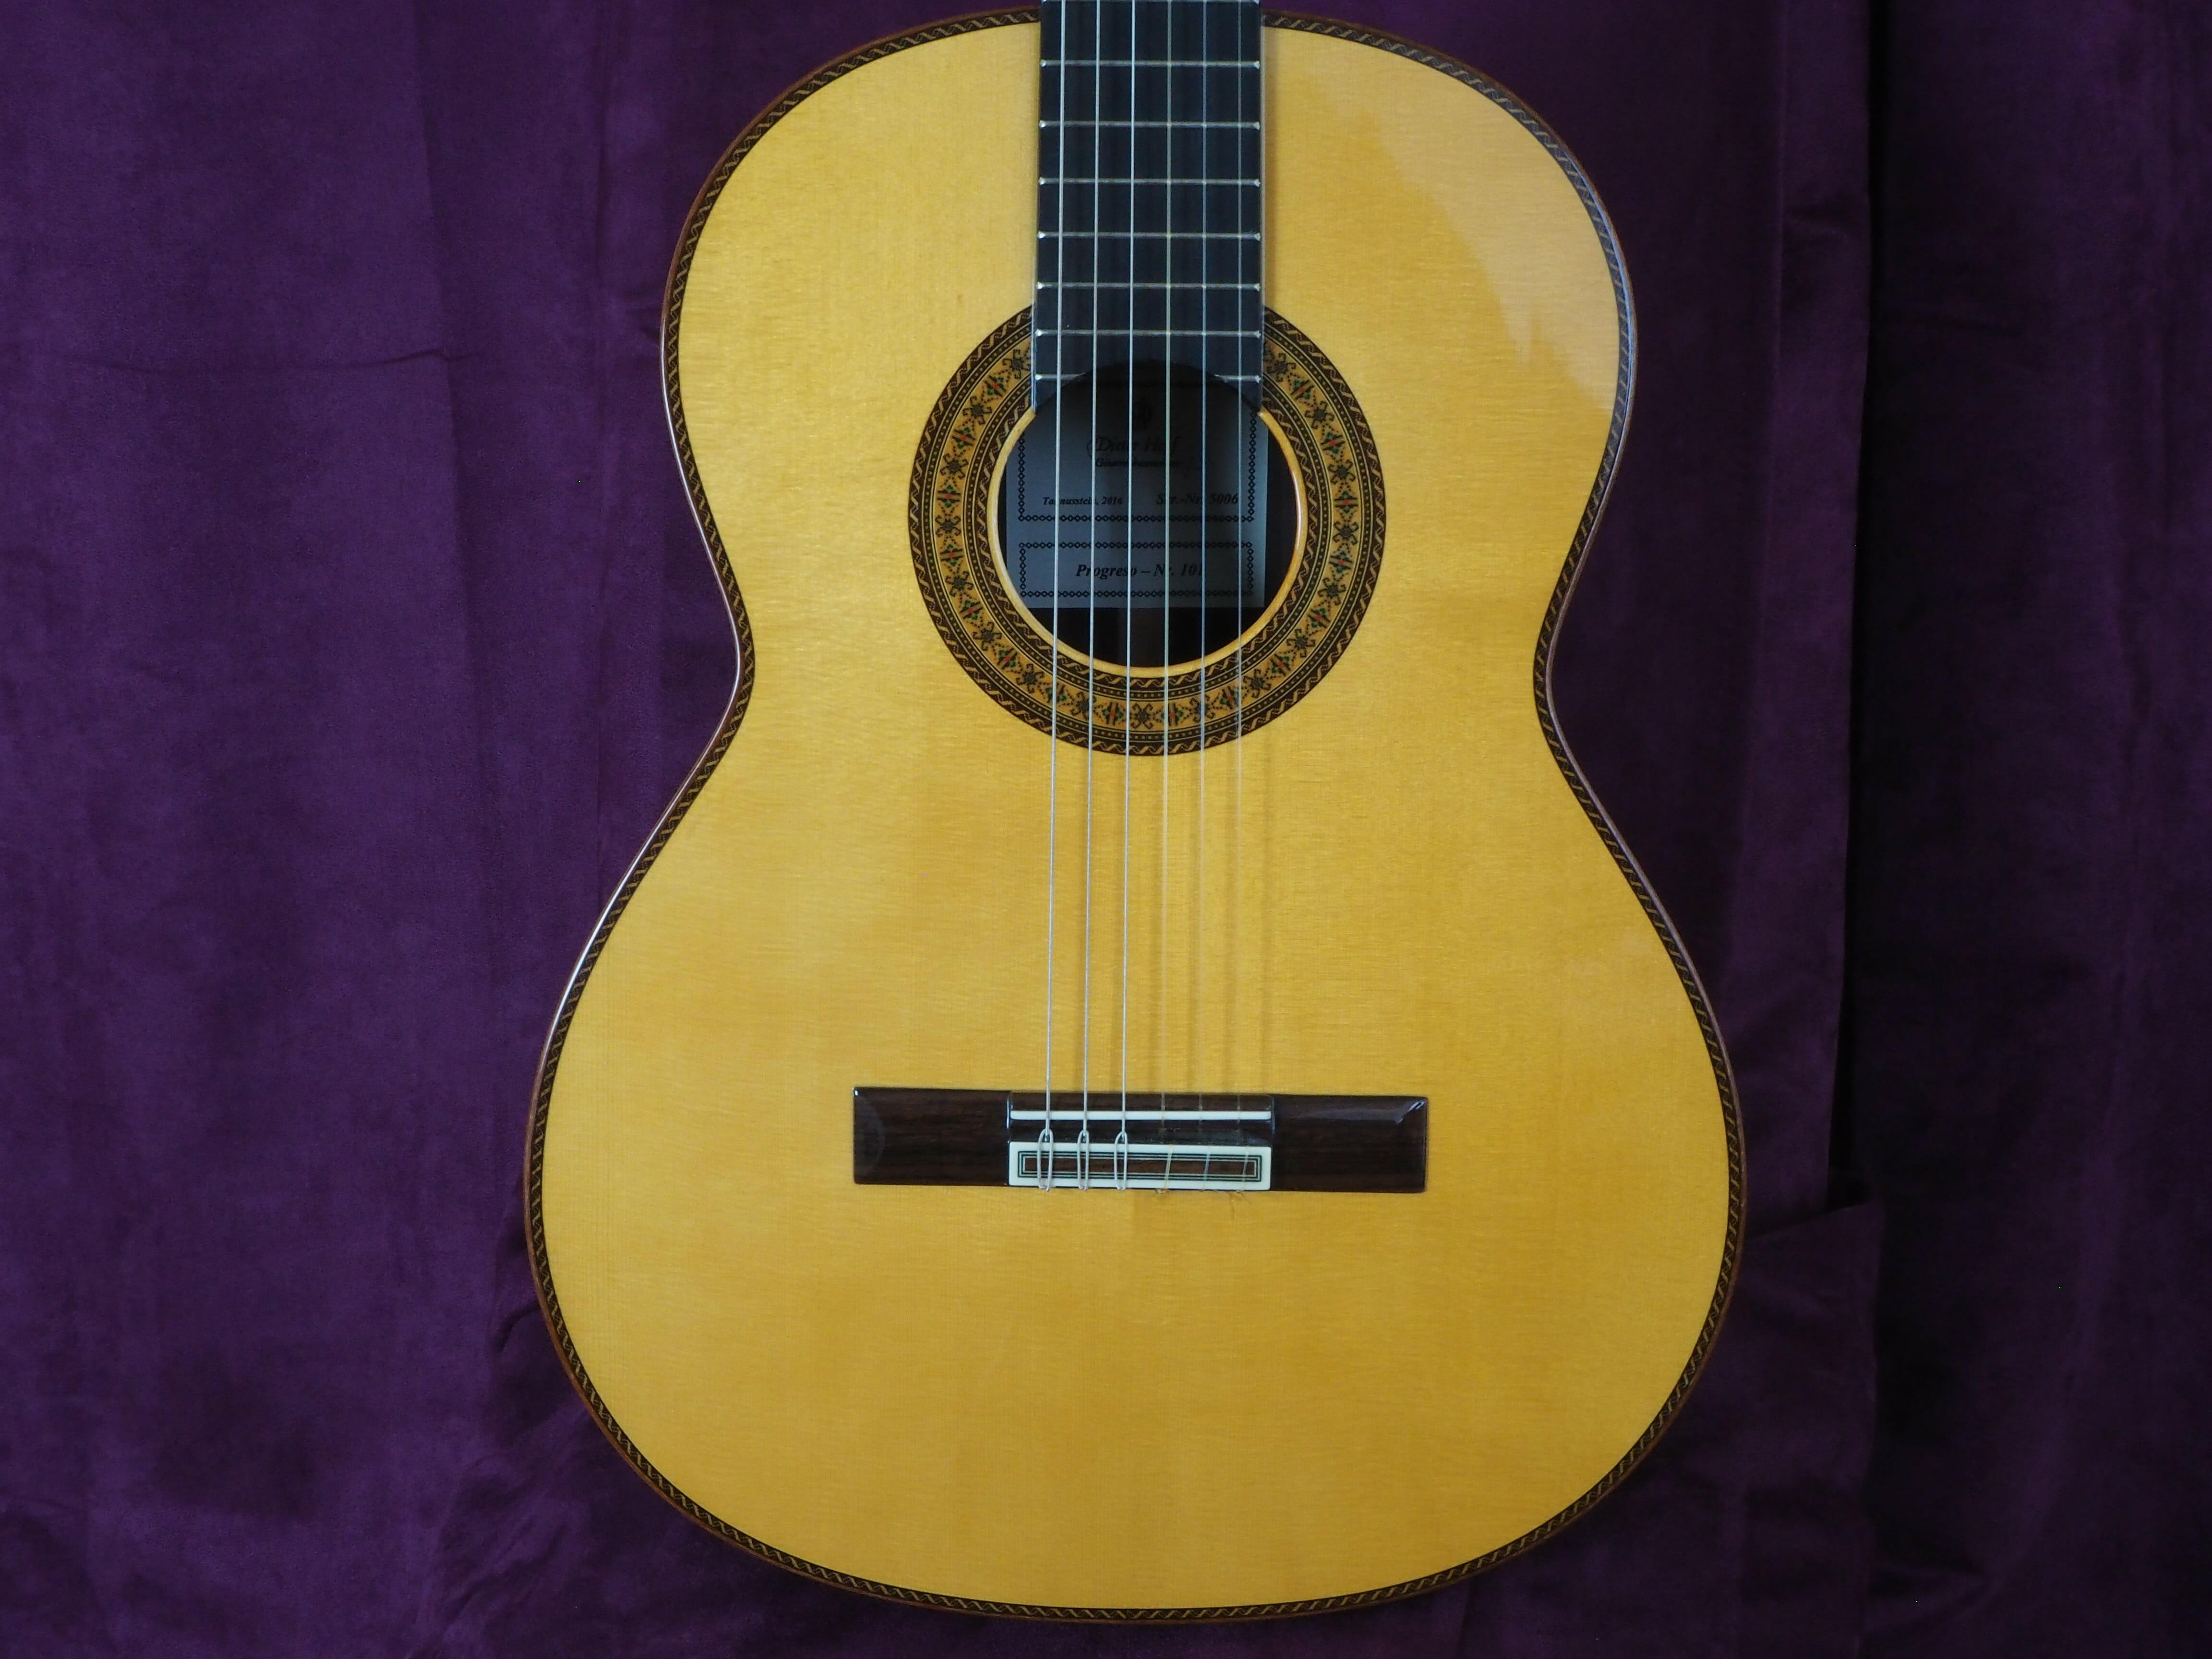 guitare classique dieter Hopf progresso